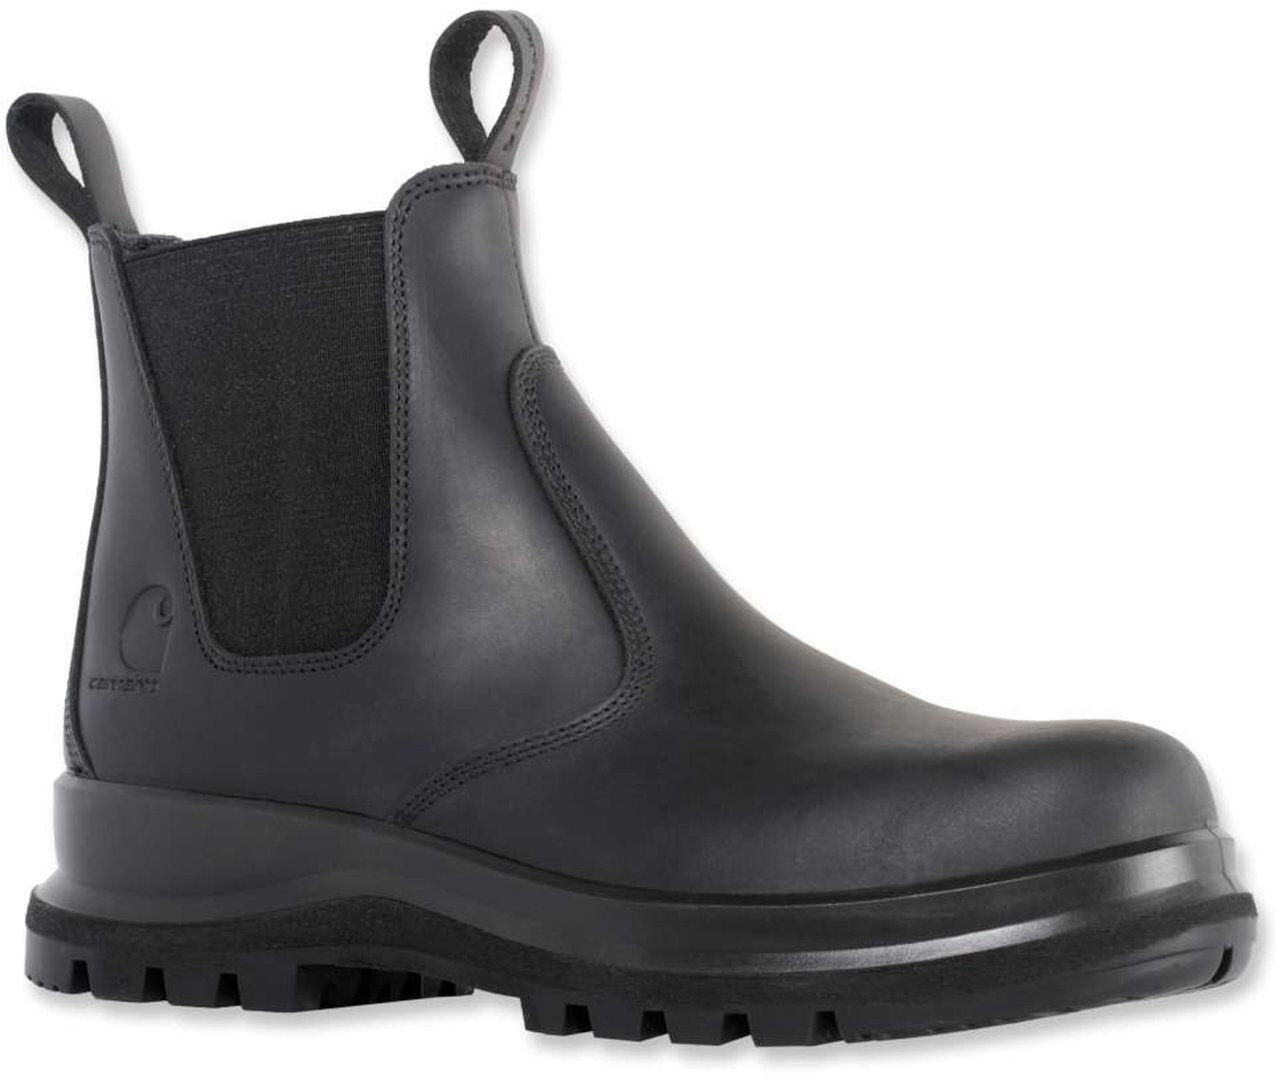 Carhartt Chelsea Rugged Flex S3 Boots Black 38